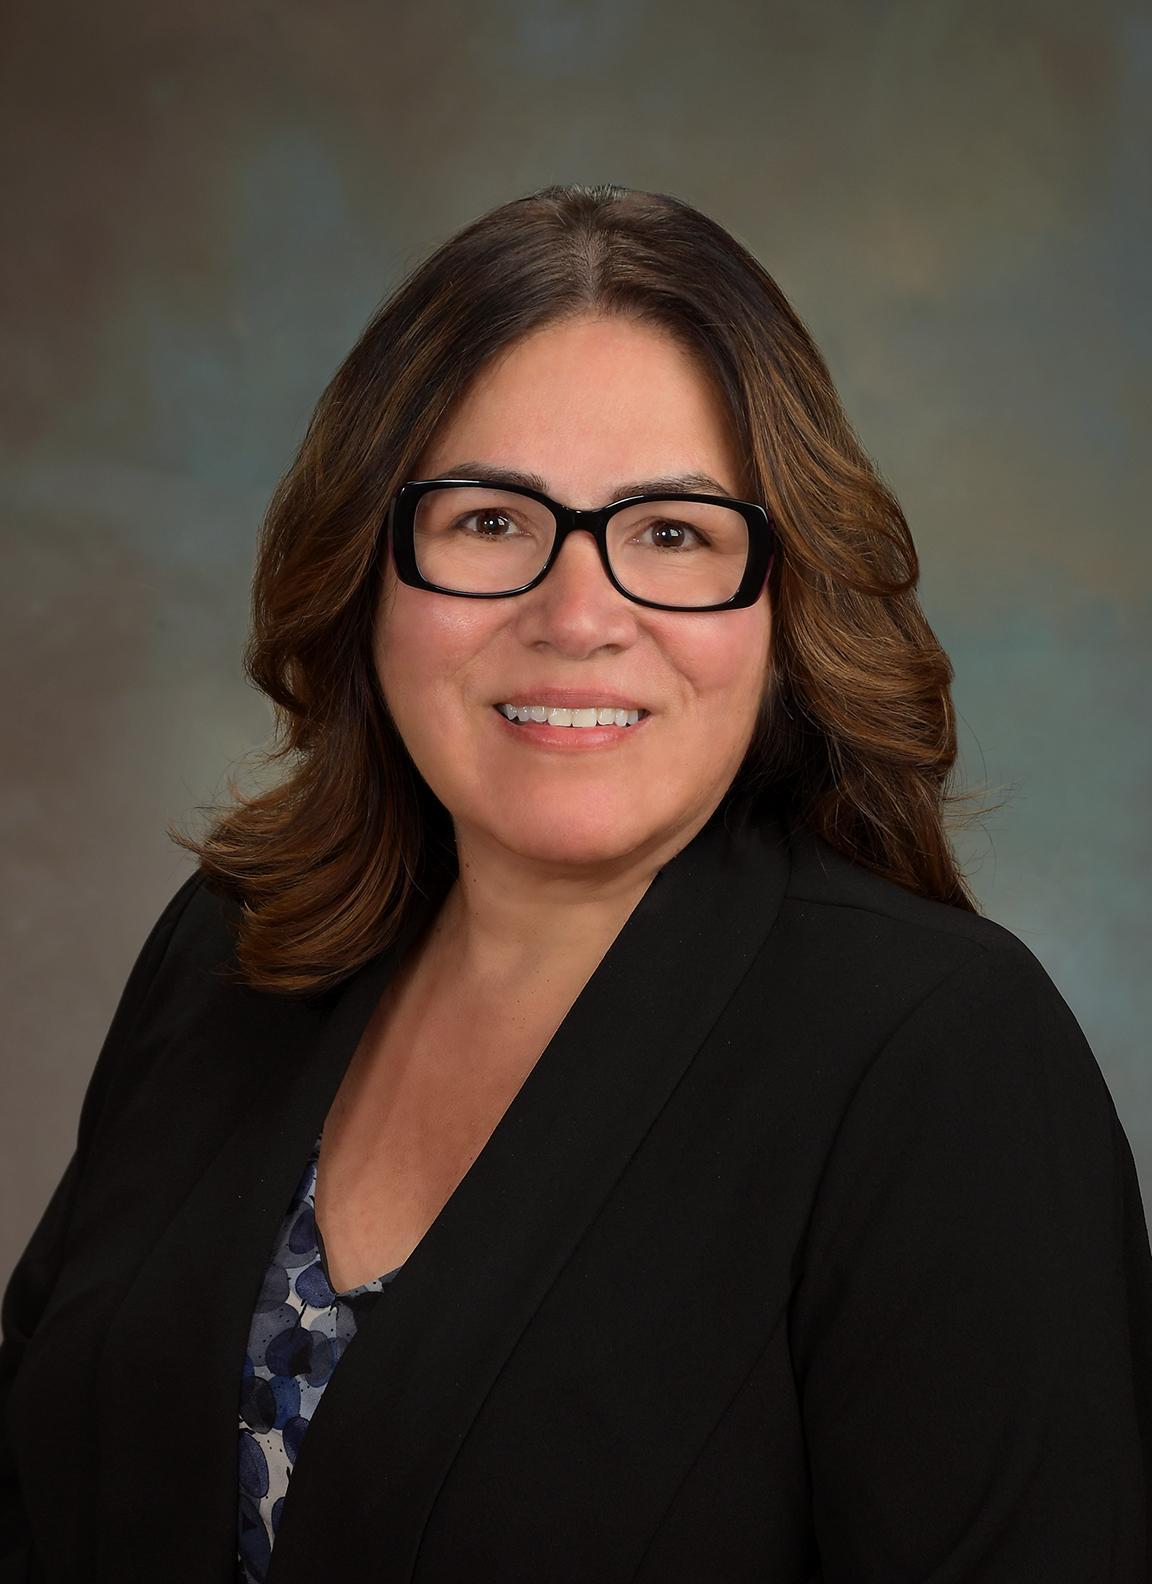 FUHSD Superintendent, Ilsa Garza-Gonzalez